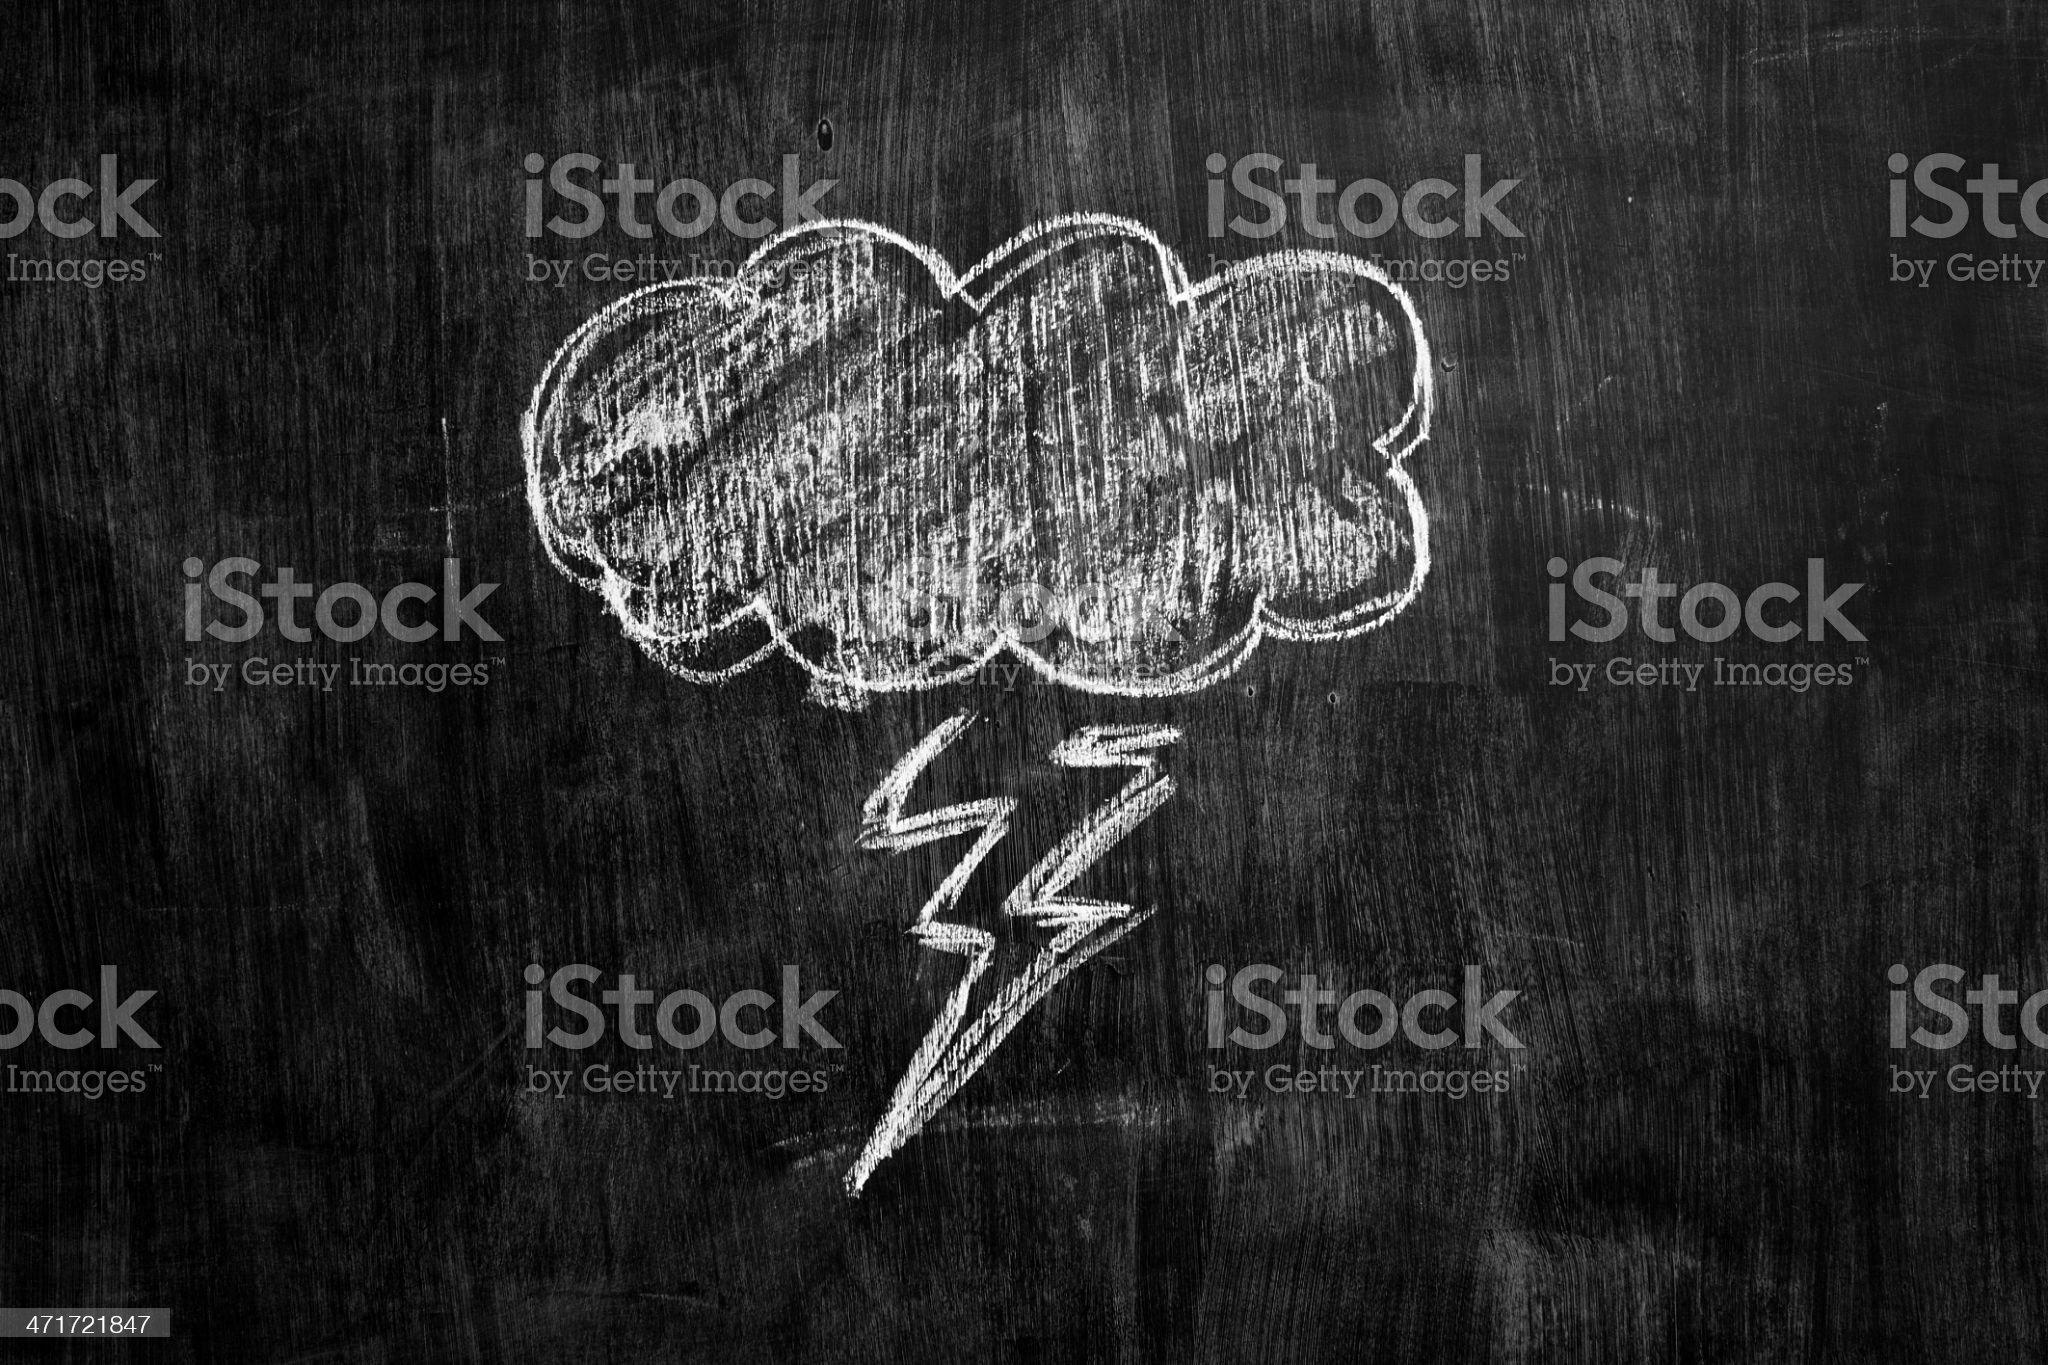 Chalk drawing of thundercloud on blackboard royalty-free stock photo